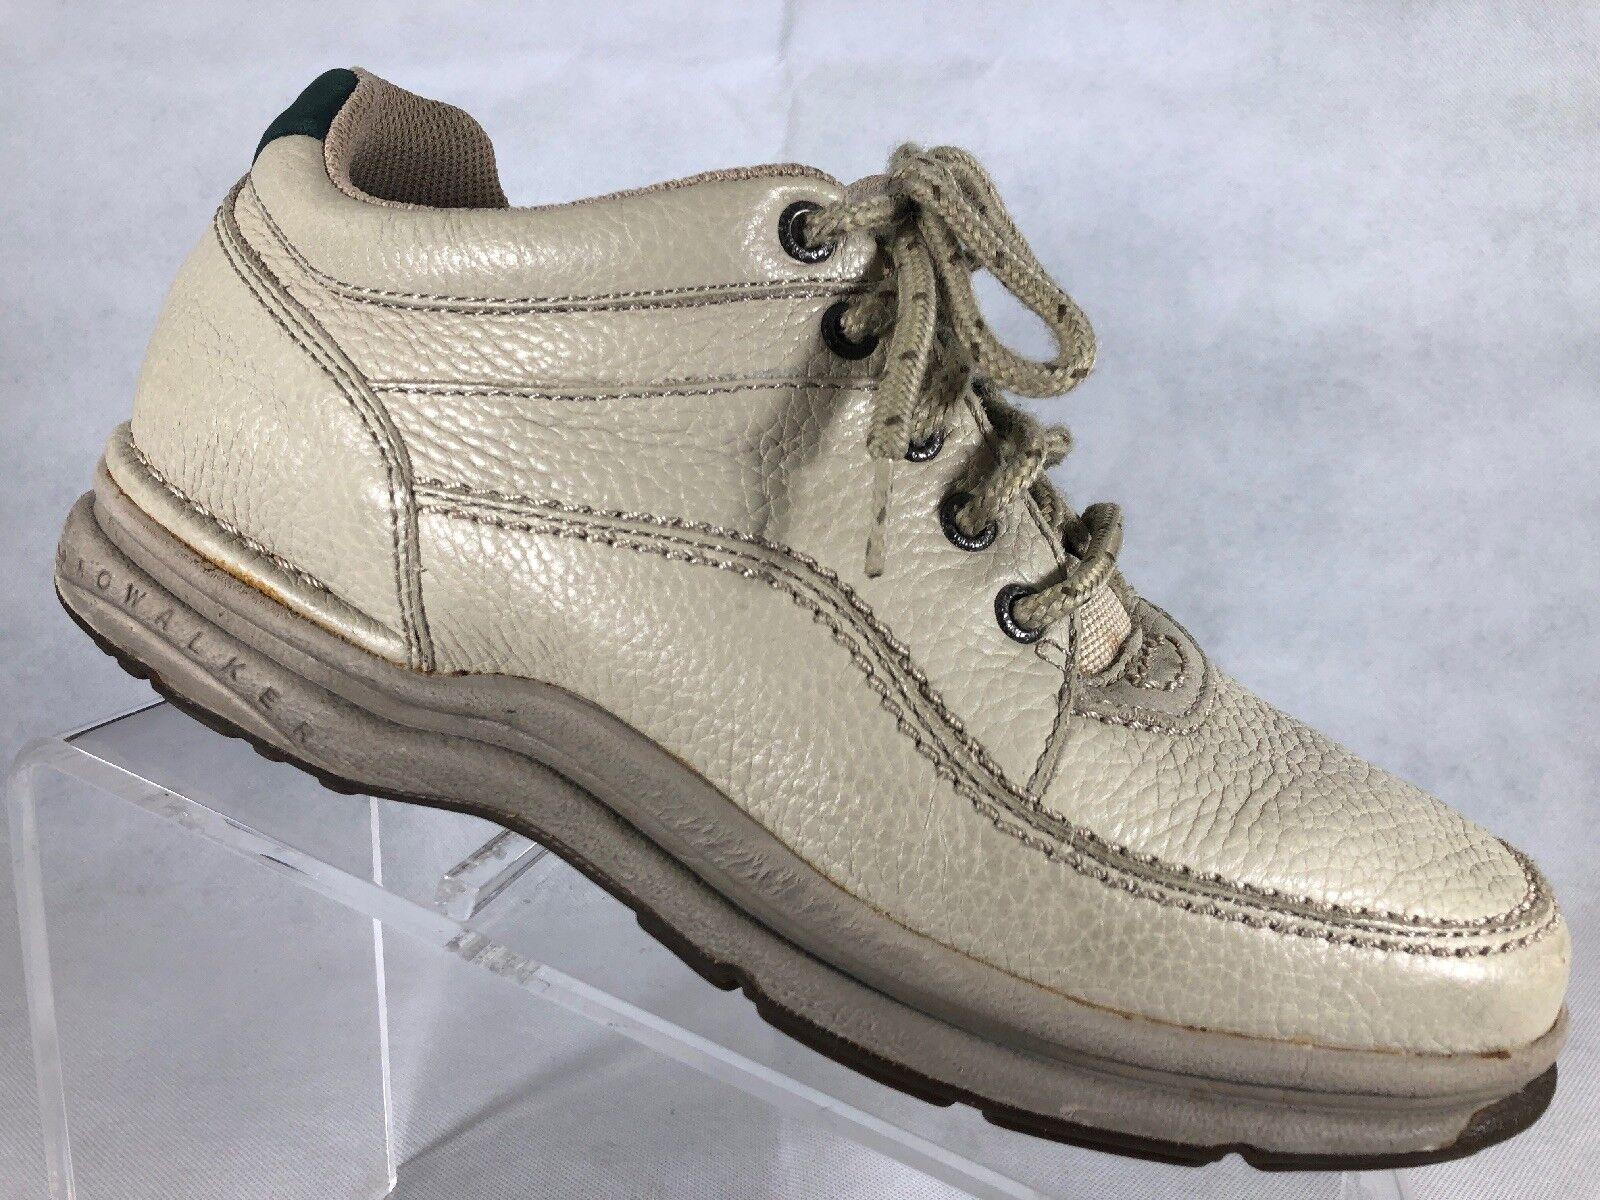 Rockport Mens Creme Leather Prowalker shoes 9W.  N2